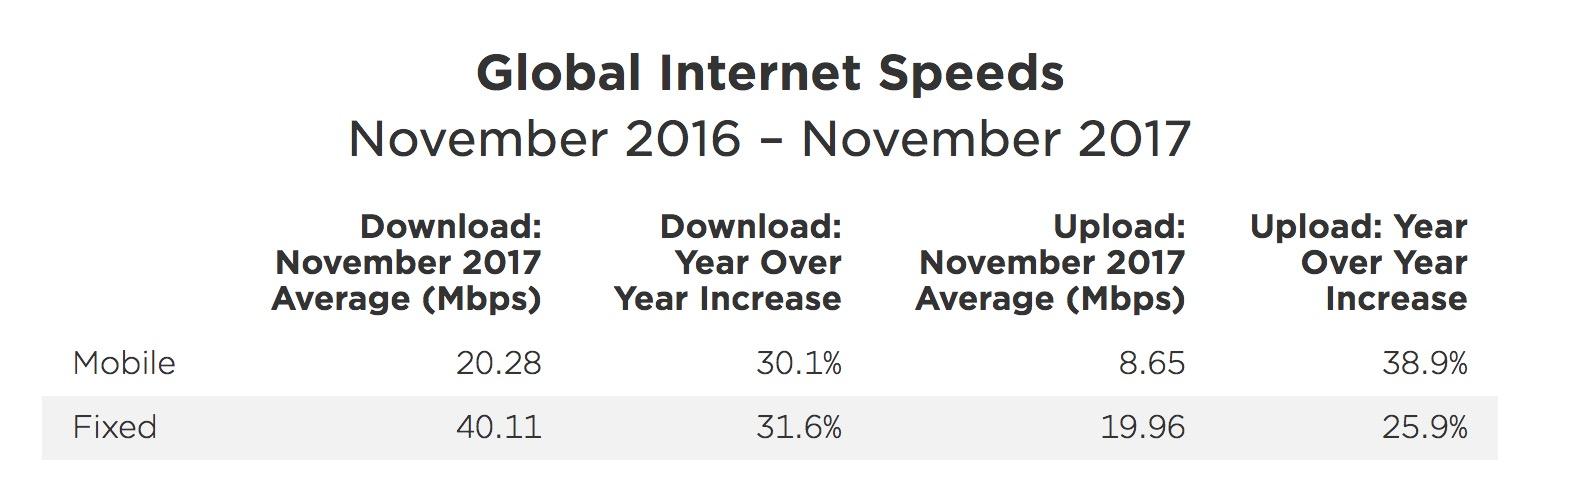 viteze internet 2017